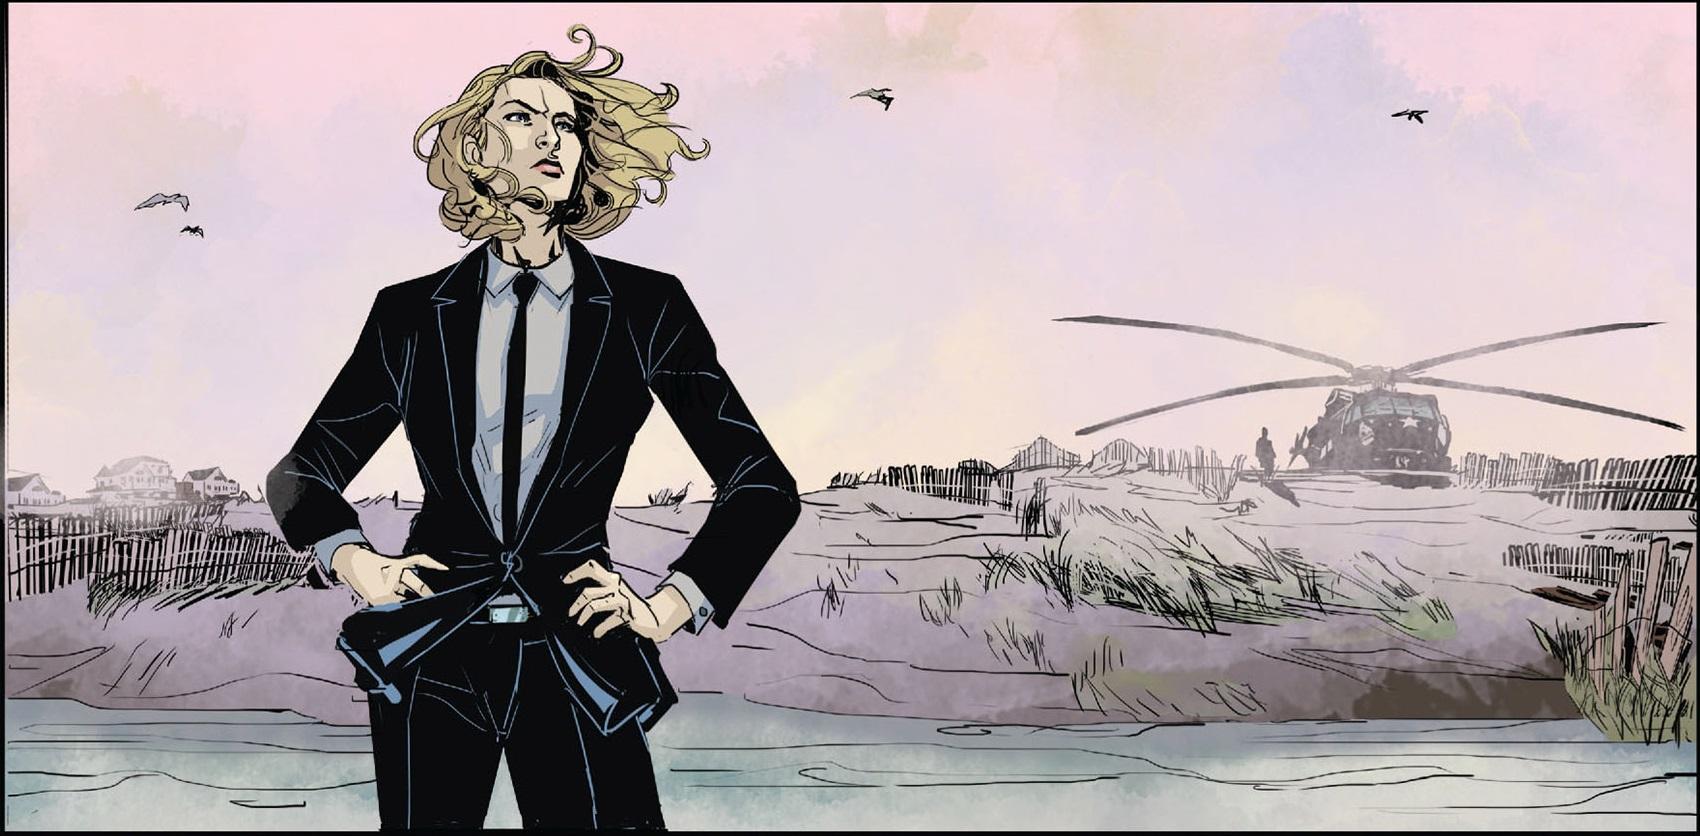 Cameron Chase, otra justiciera de DC Comics, ficha por 'Supergirl'